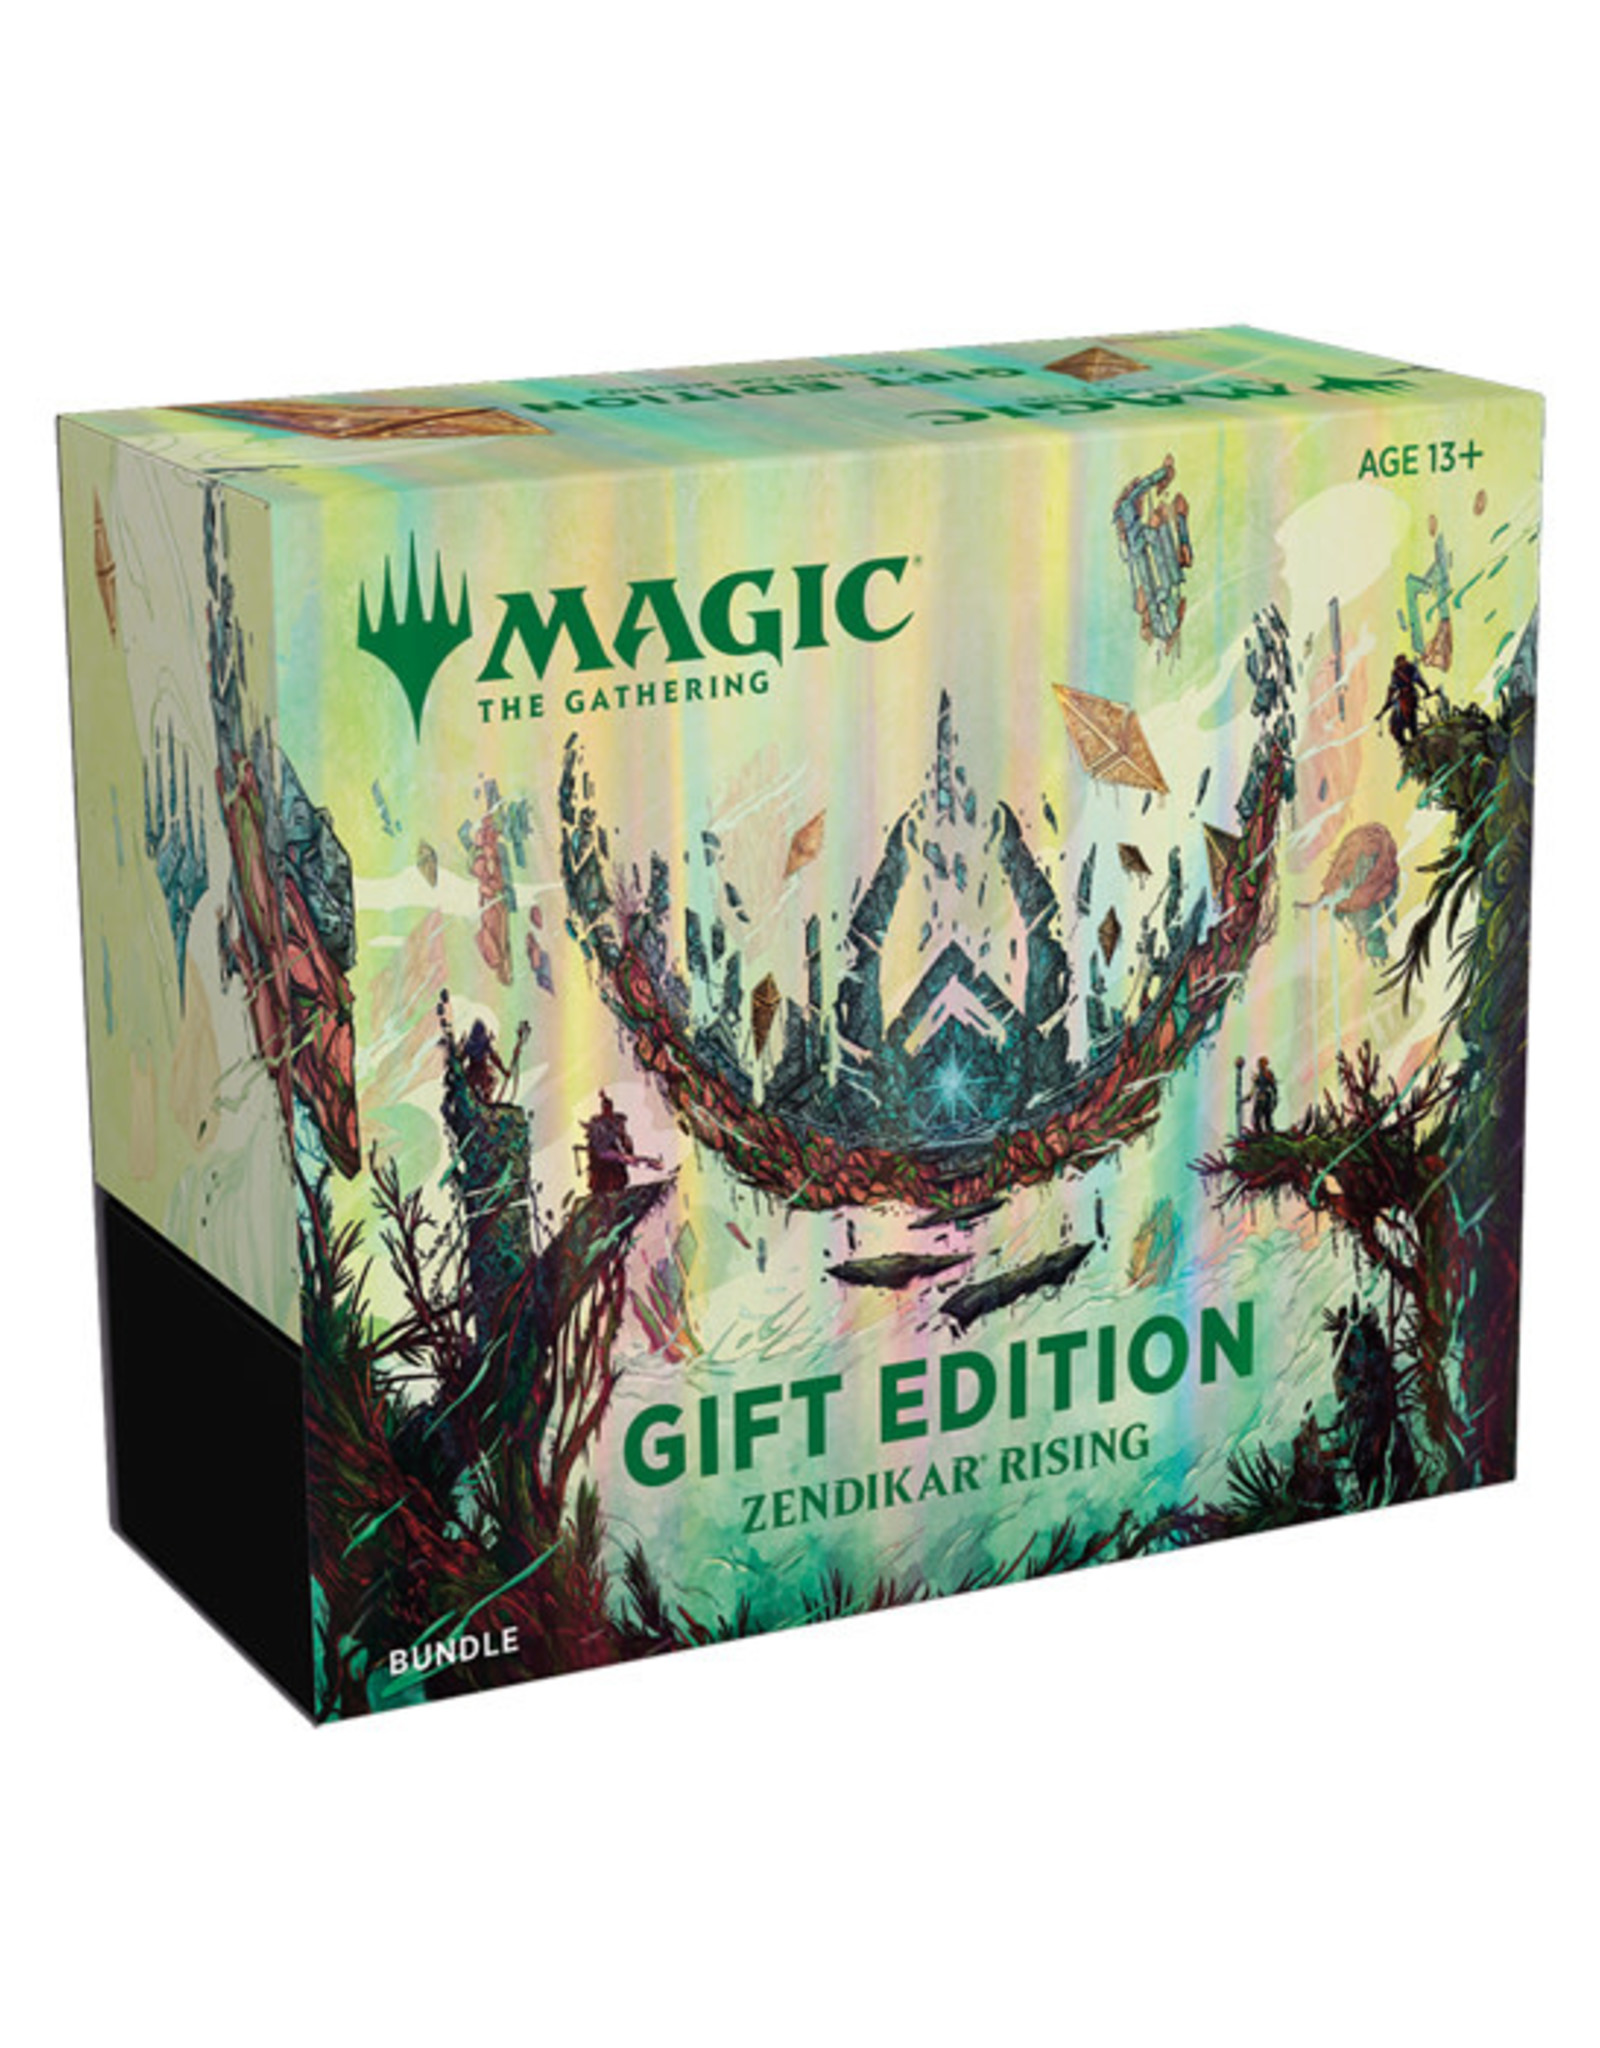 Magic: The Gathering Magic: The Gathering - Zendikar Rising - Bundle - Gift Edition